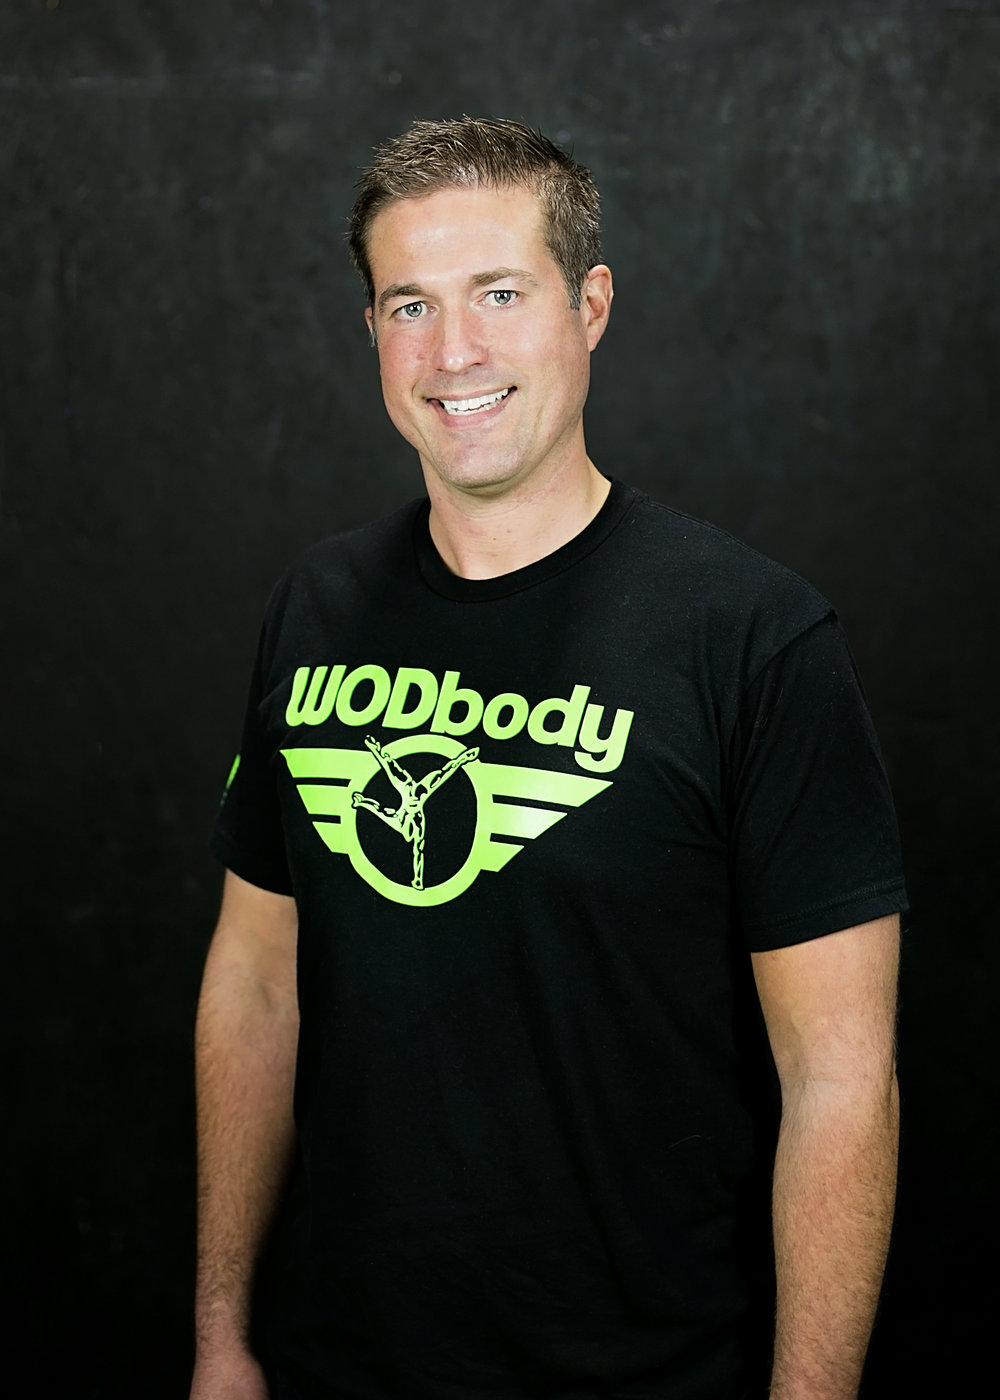 wodbody2.jpg